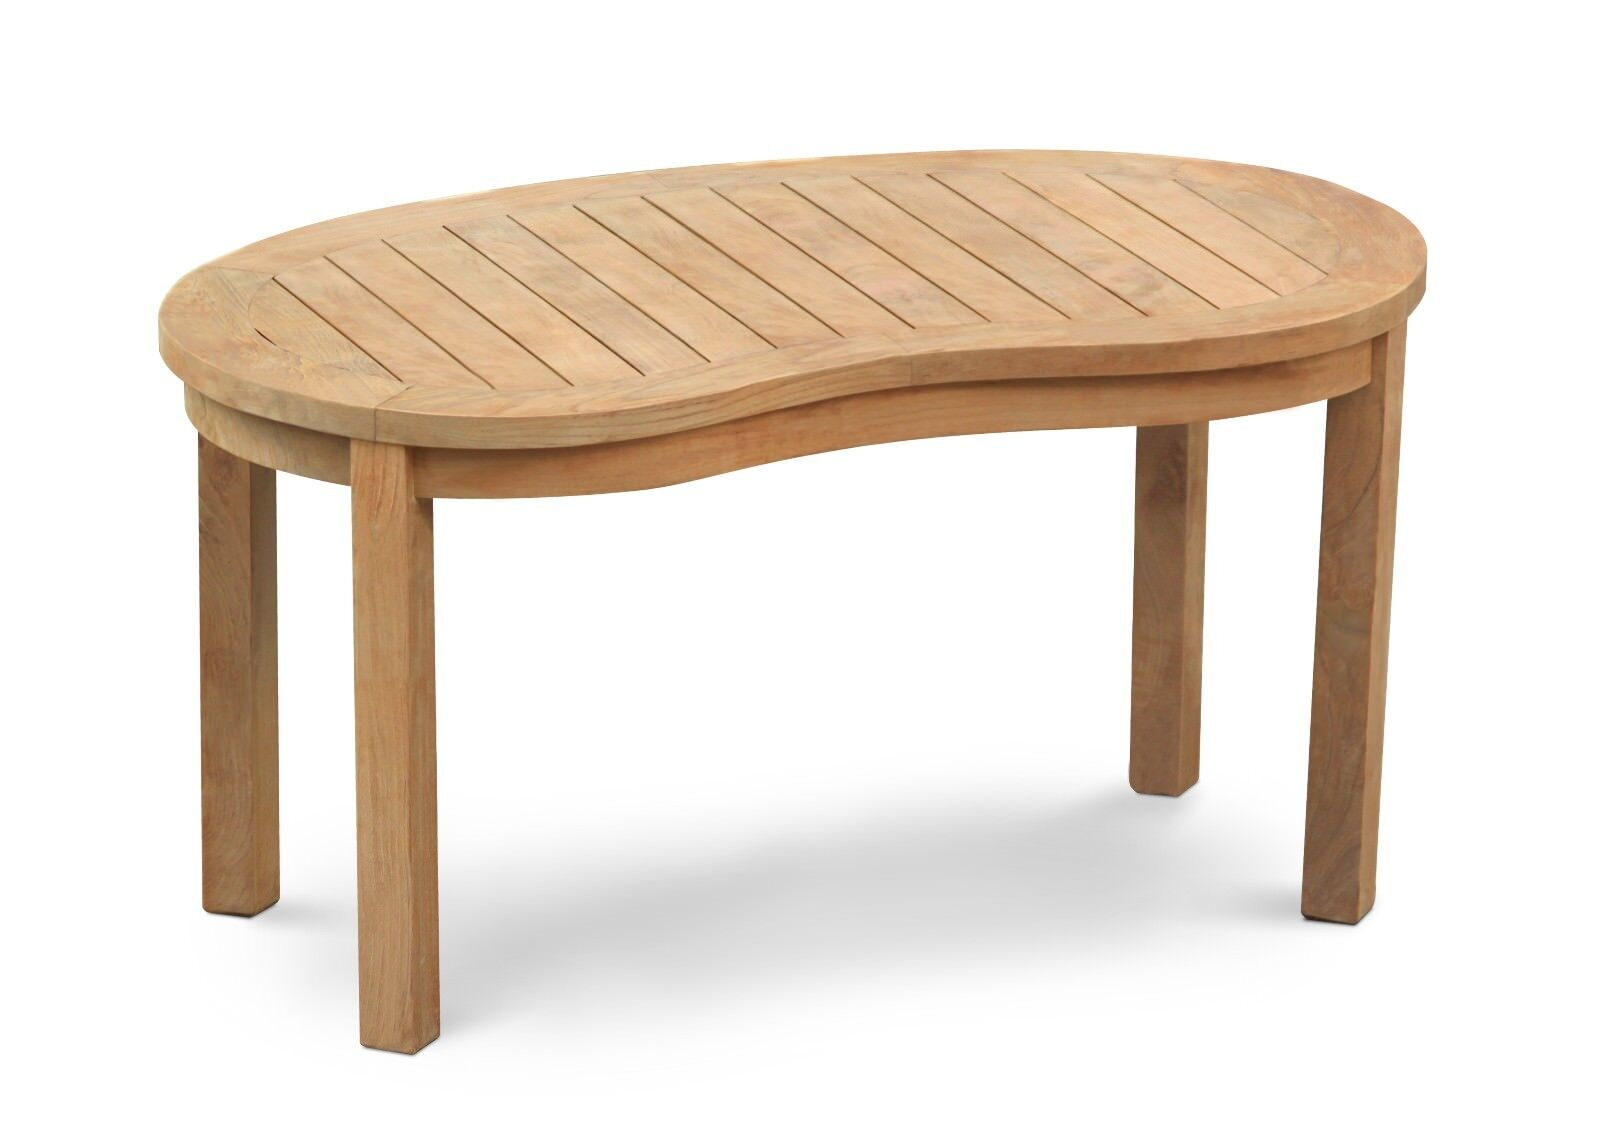 Premium Teak Banana Coffee Table 108 Cm Oval Kidney Shaped Wooden Side